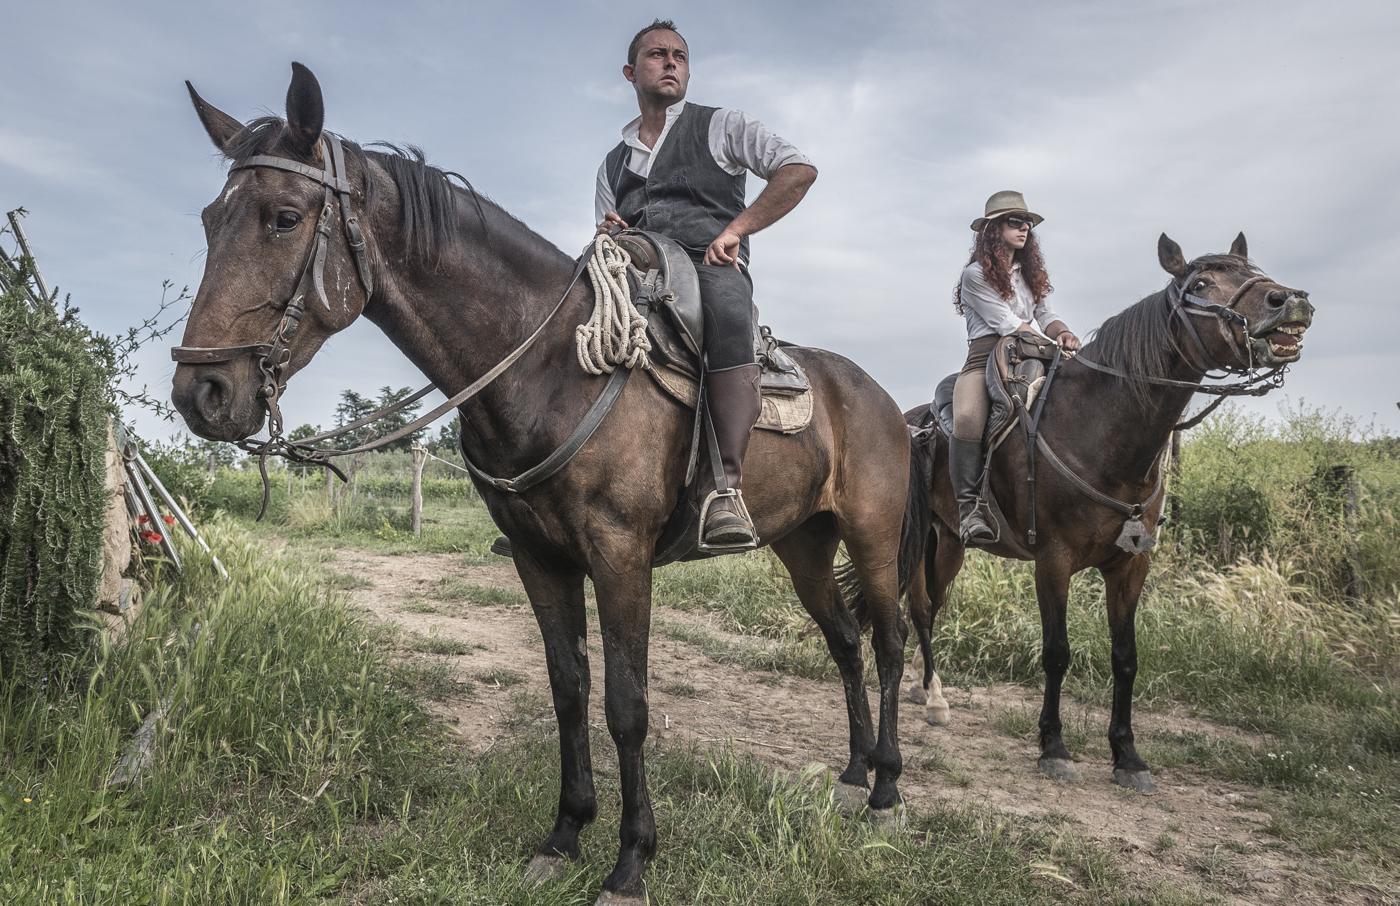 Gabrielle Saveri_USA_Italian Cowboys (I Butteri) (1 of 15).jpg